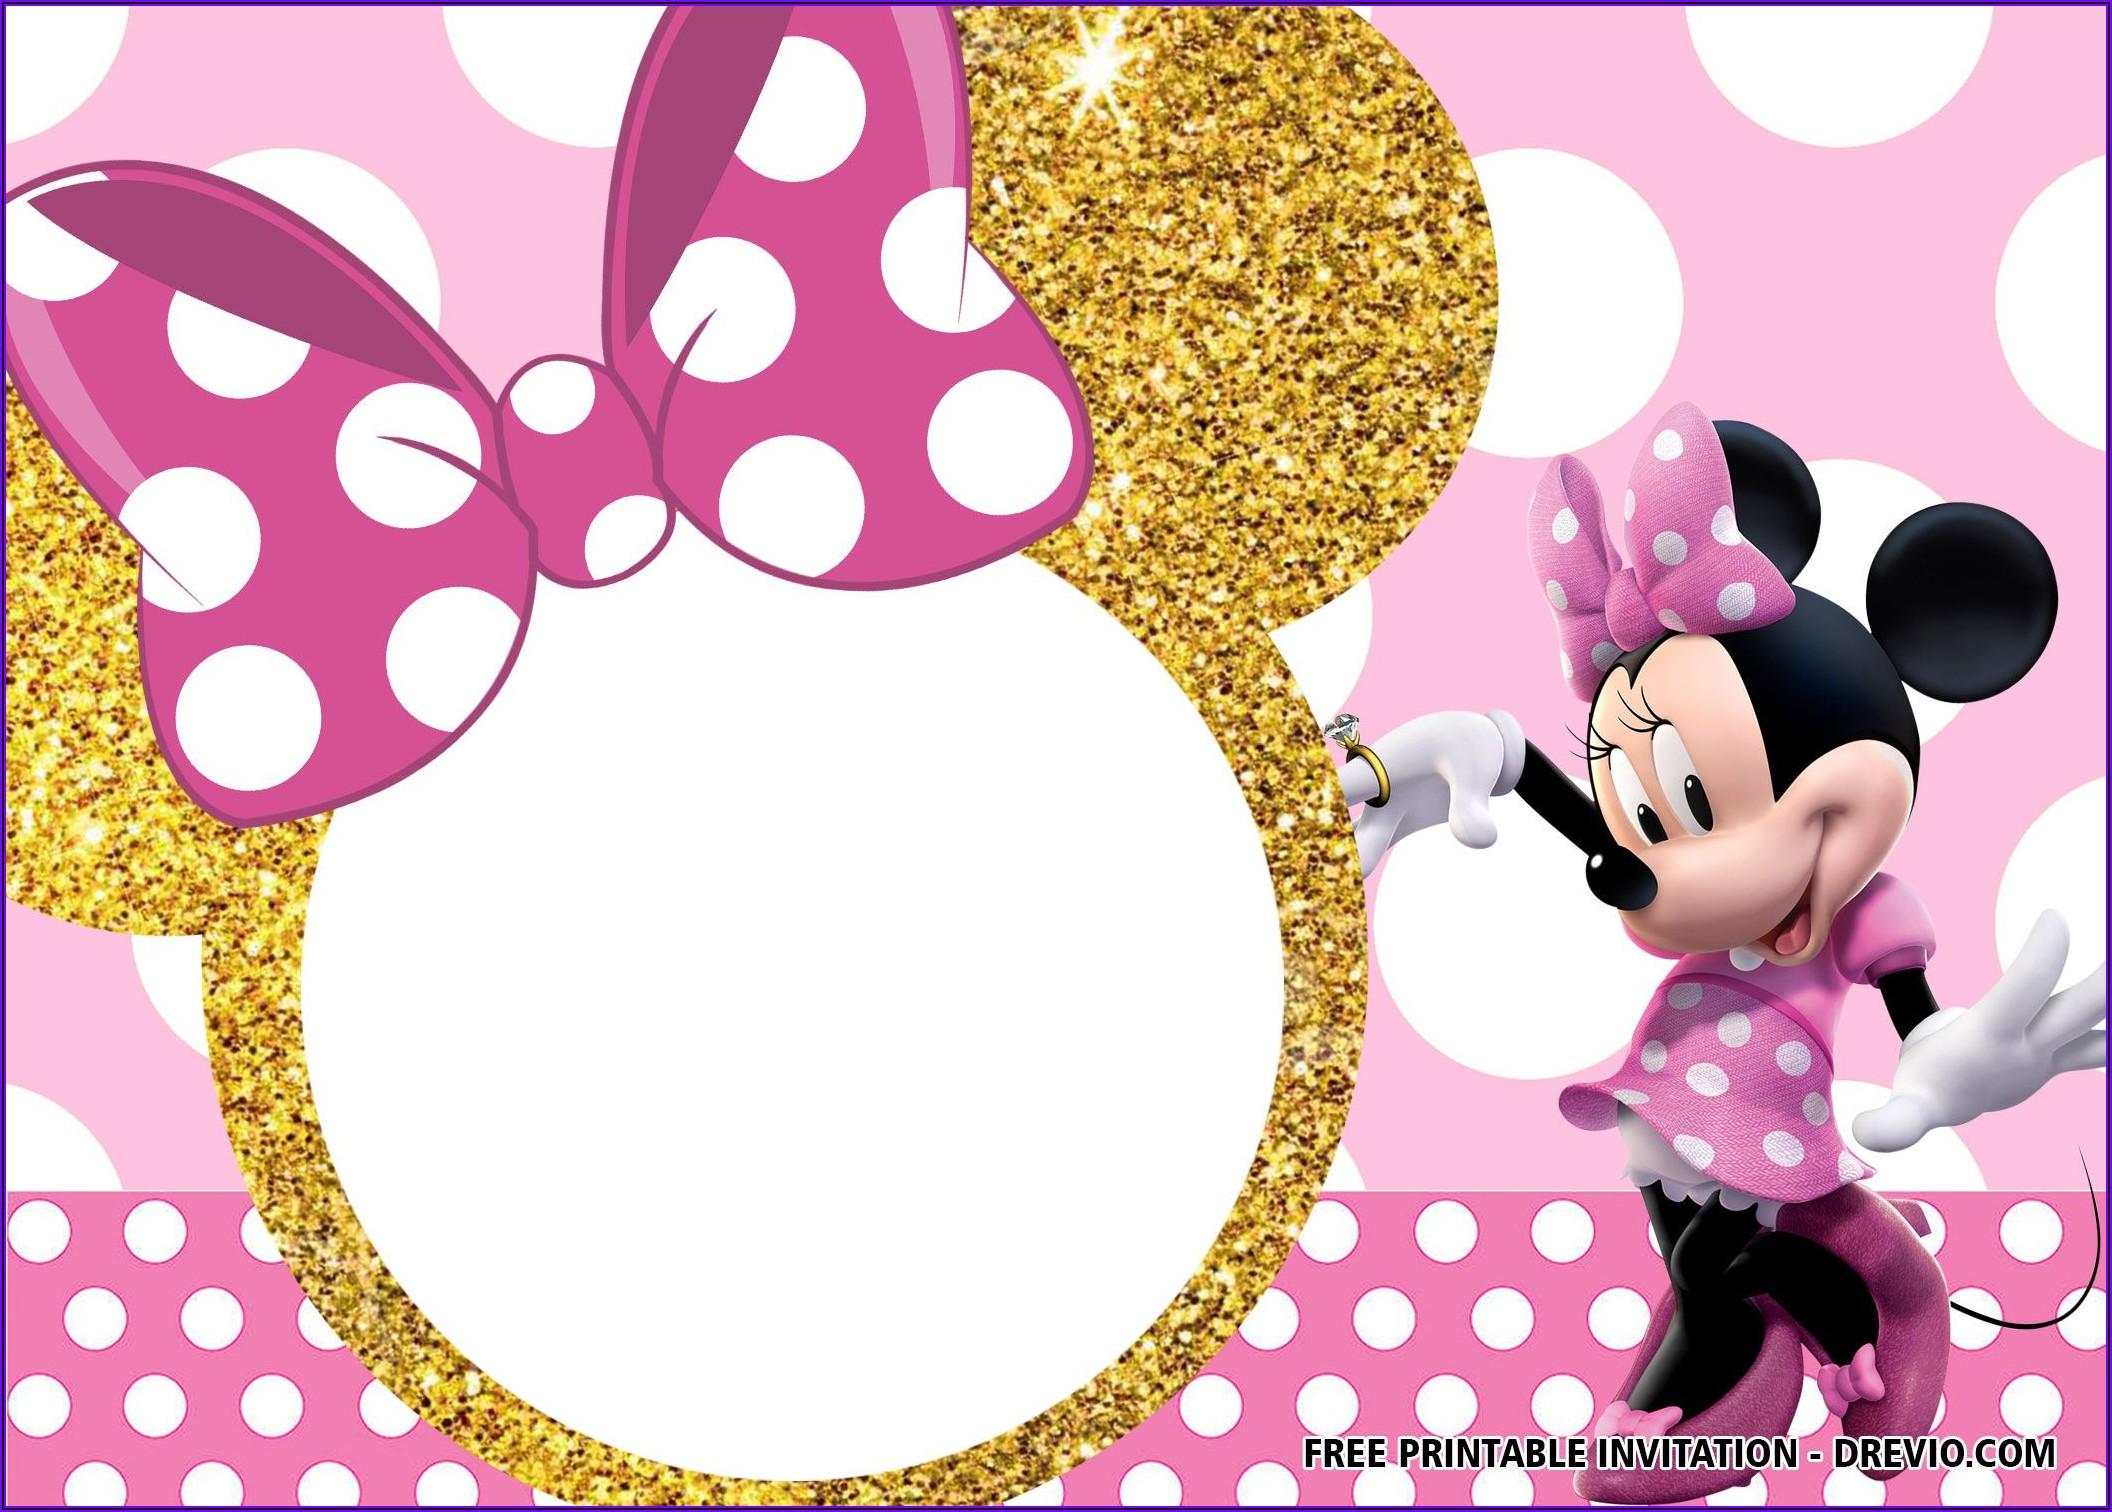 Free Online Editable Minnie Mouse Invitations